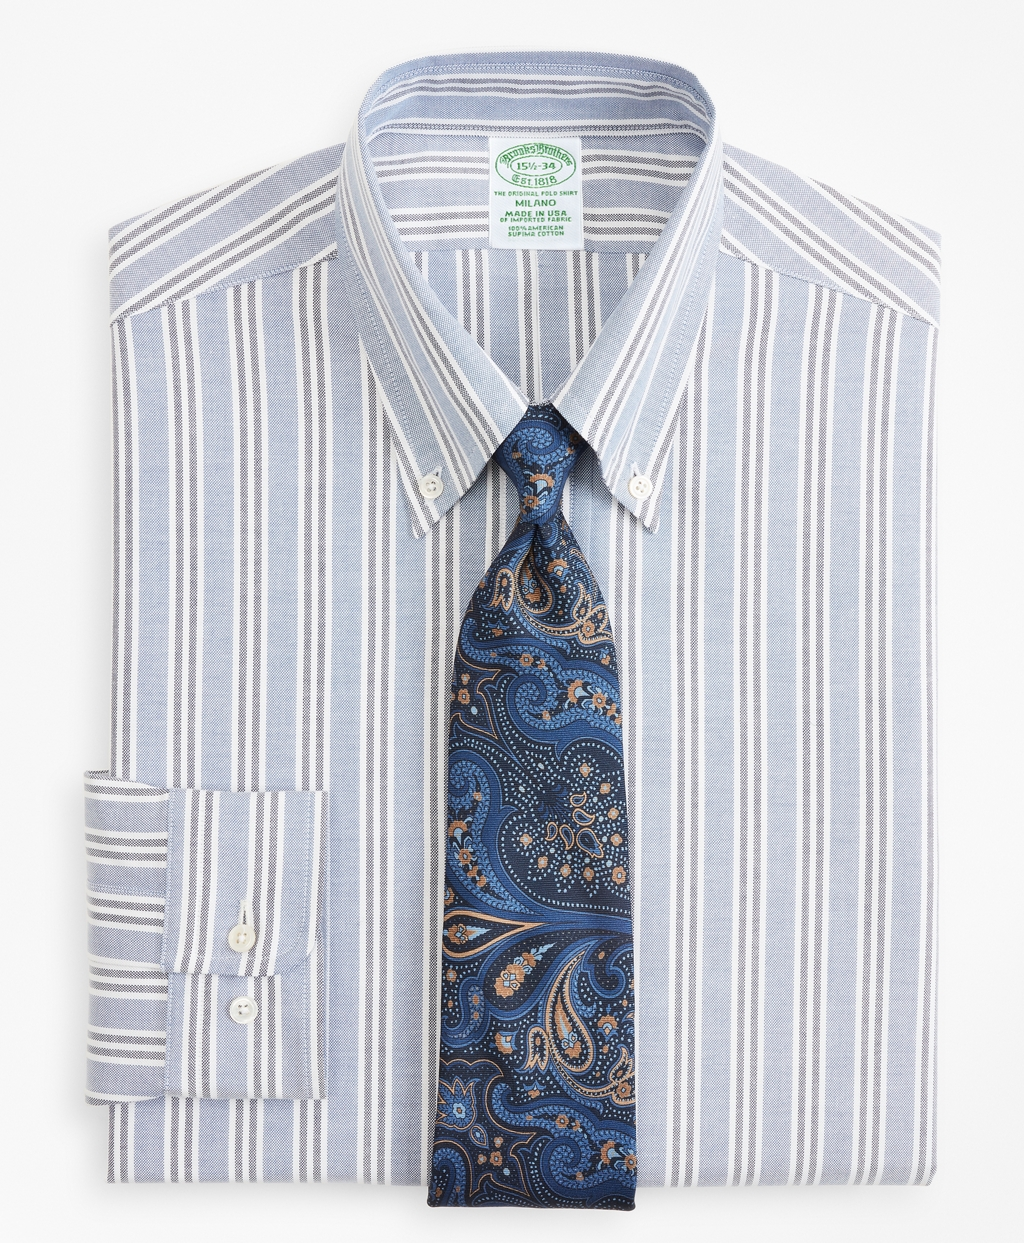 Edwardian Men's Shirts & Sweaters Brooks Brothers Mens Original Polo Button-Down Oxford Extra Slim Slim-Fit Dress Shirt Triple Stripe $140.00 AT vintagedancer.com